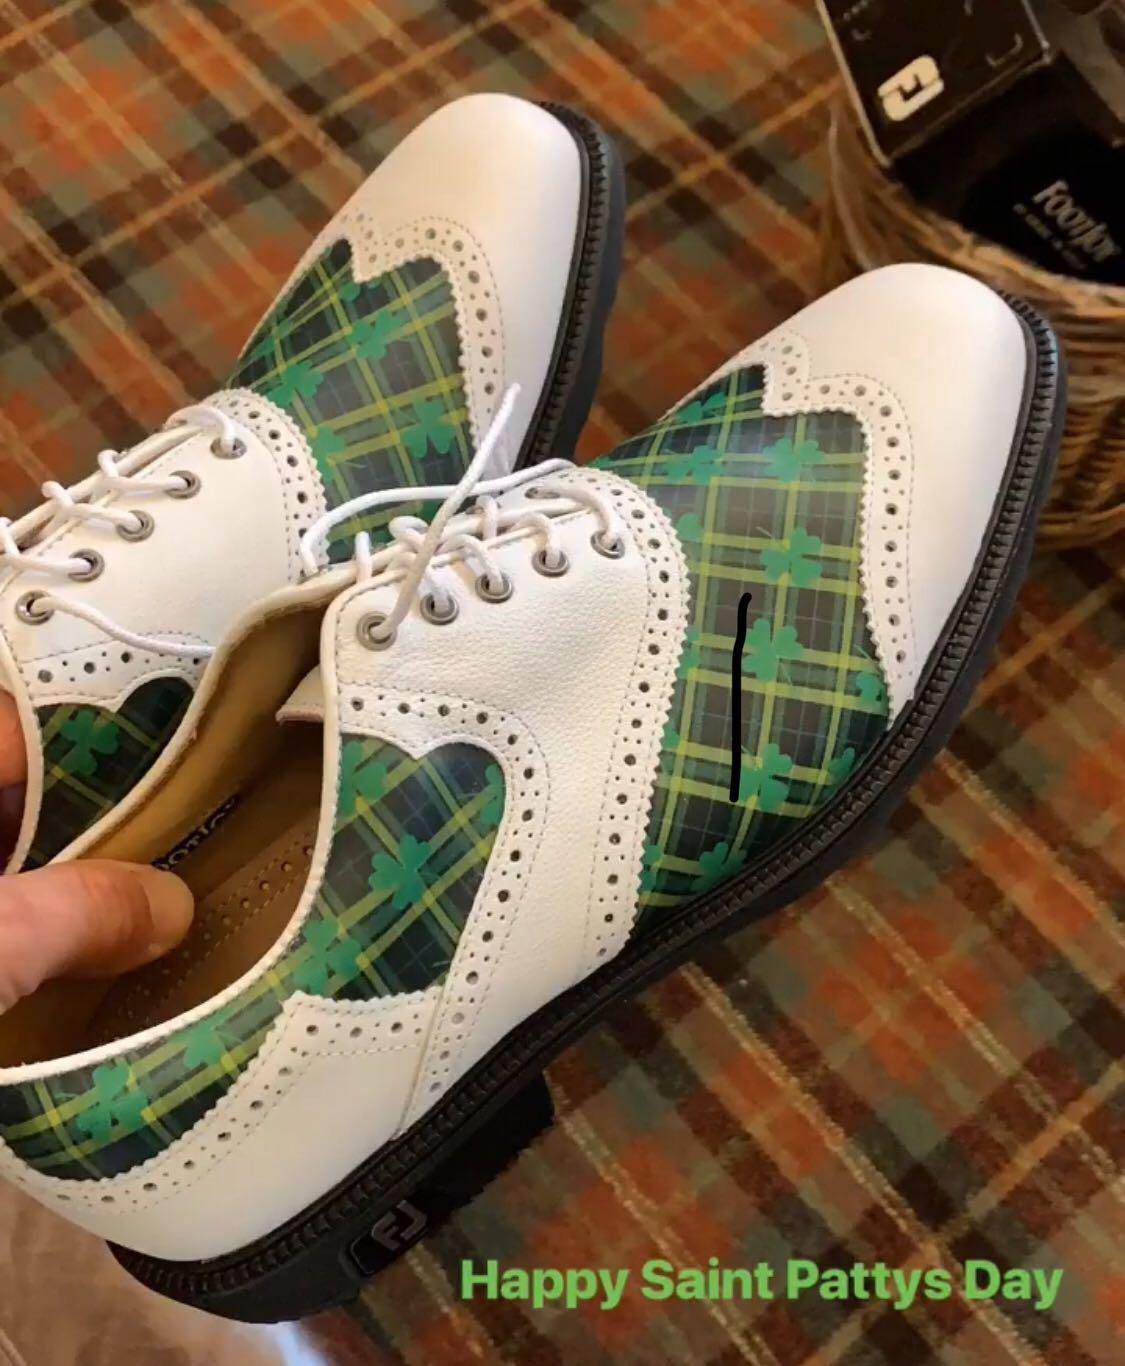 Justin Thomas's festive custom golf shoes.